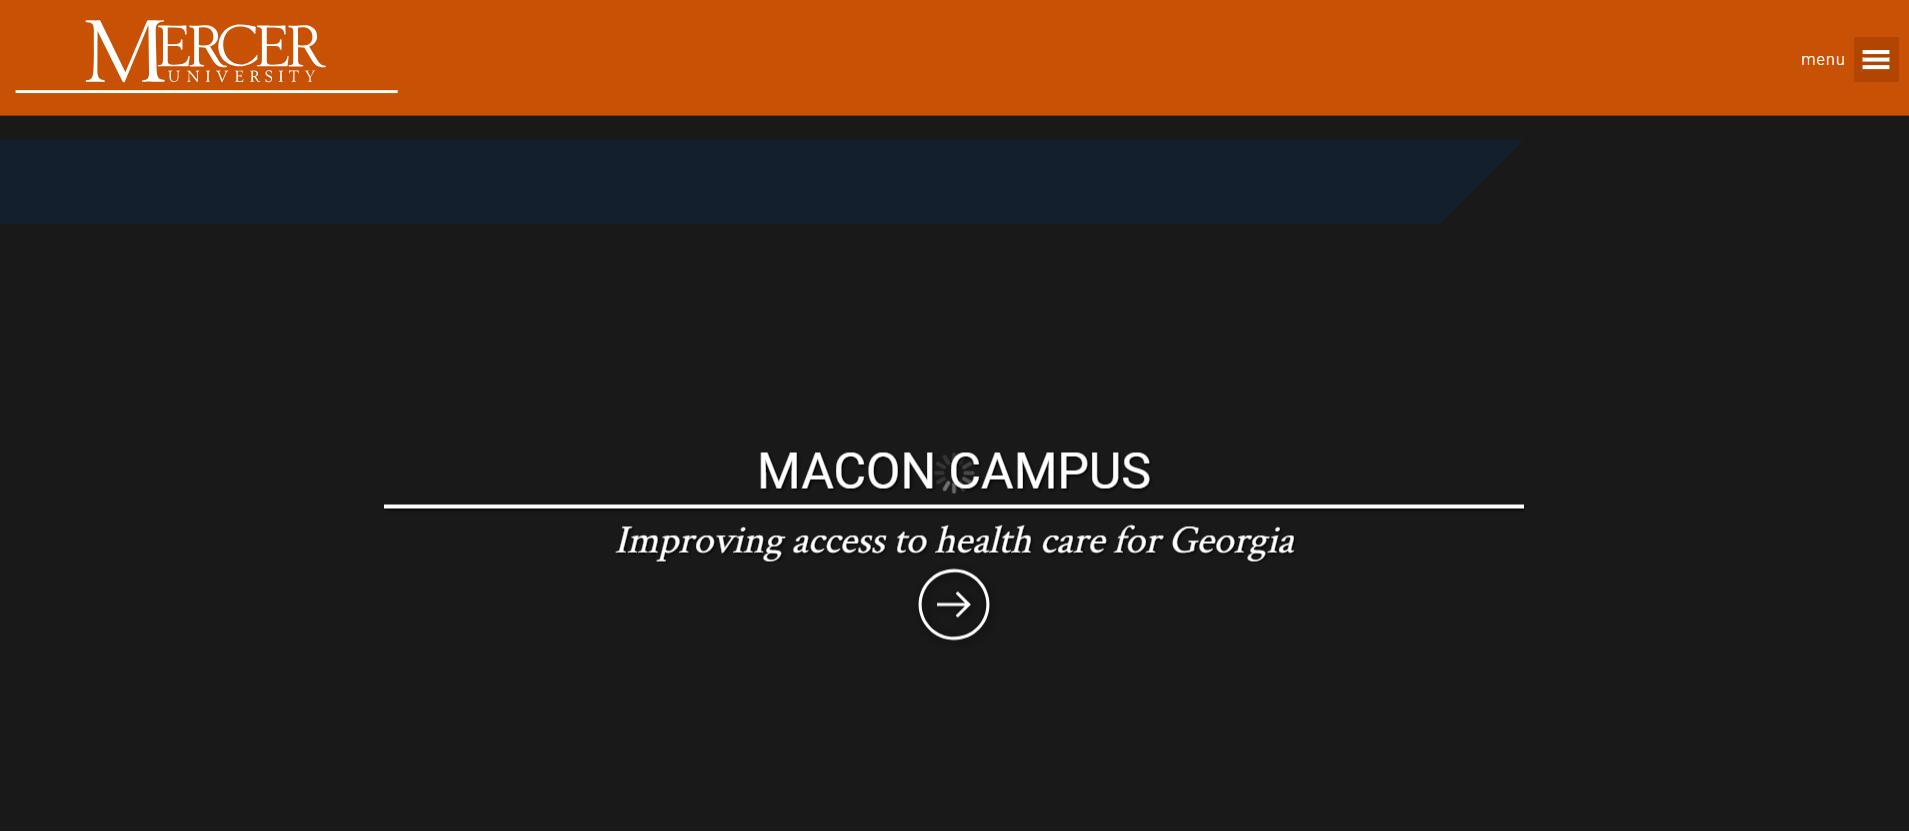 The School of Medicine at Mercer University